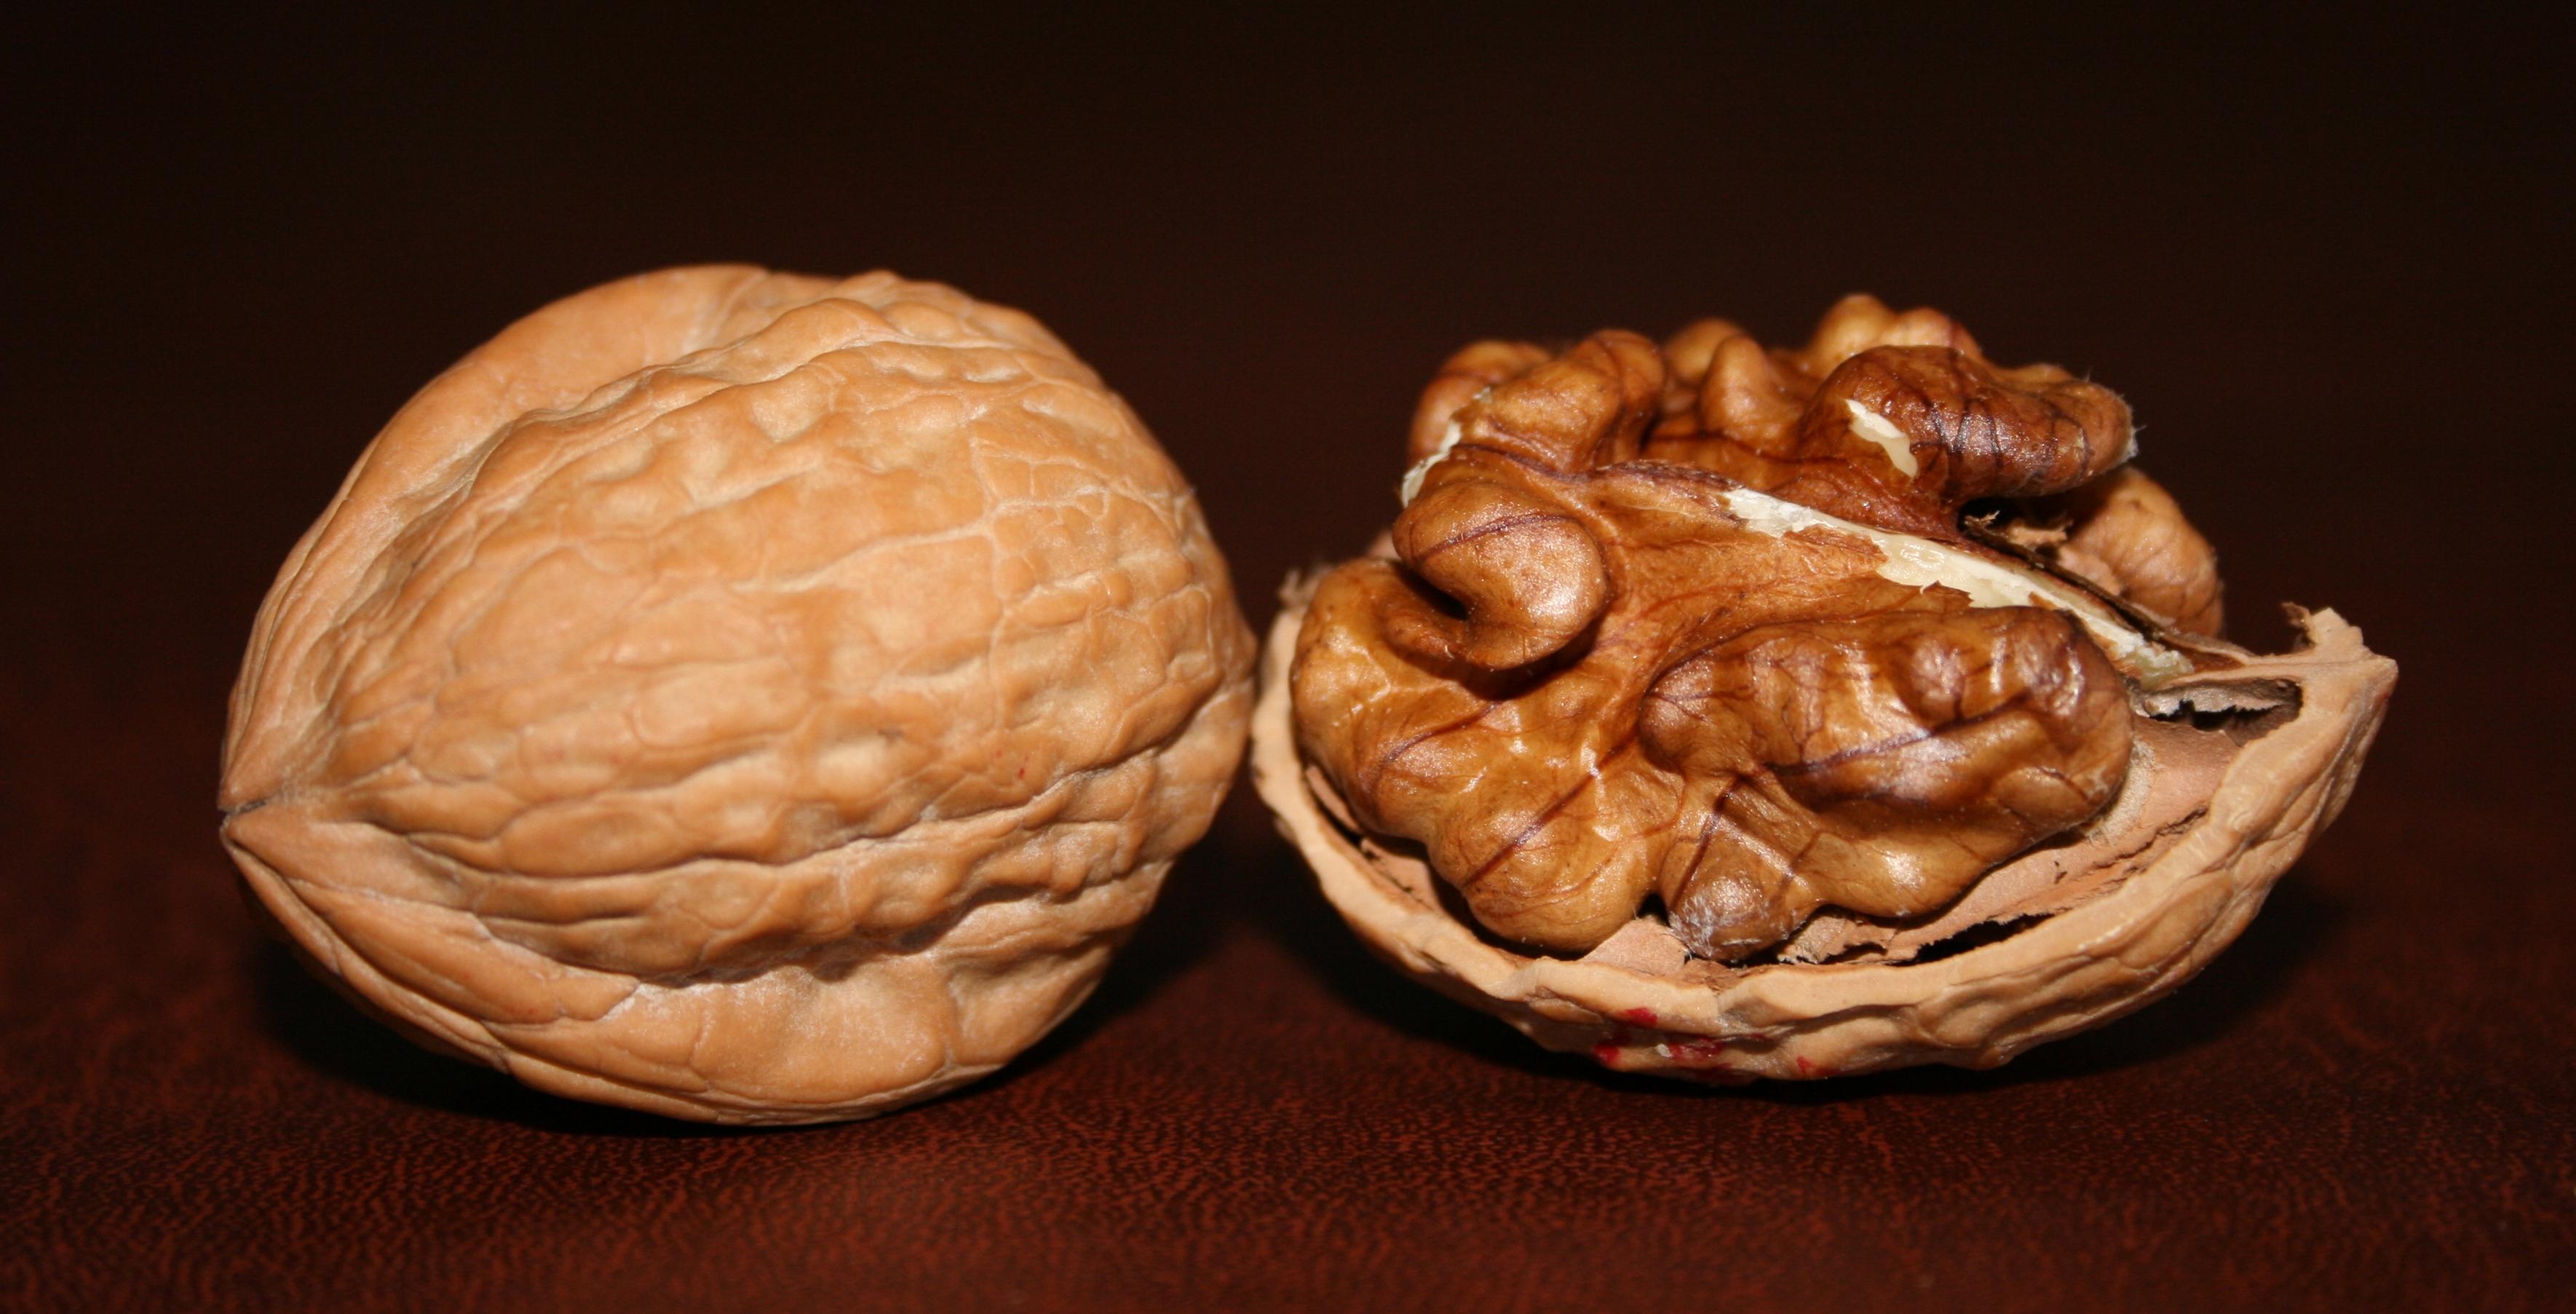 http://upload.wikimedia.org/wikipedia/commons/e/ec/Two_English_Walnuts.jpg